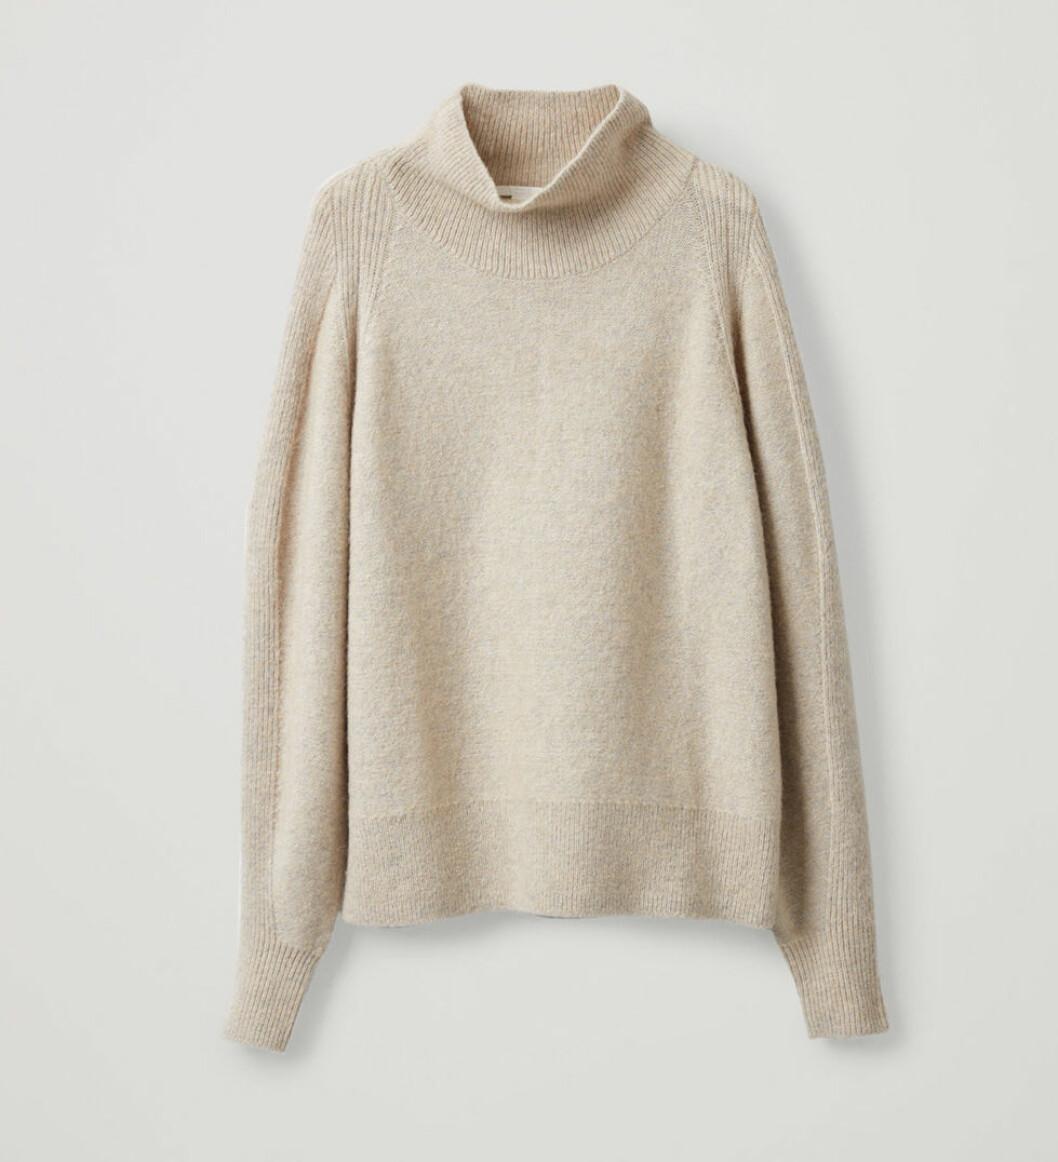 Beige stickad tröja från cos